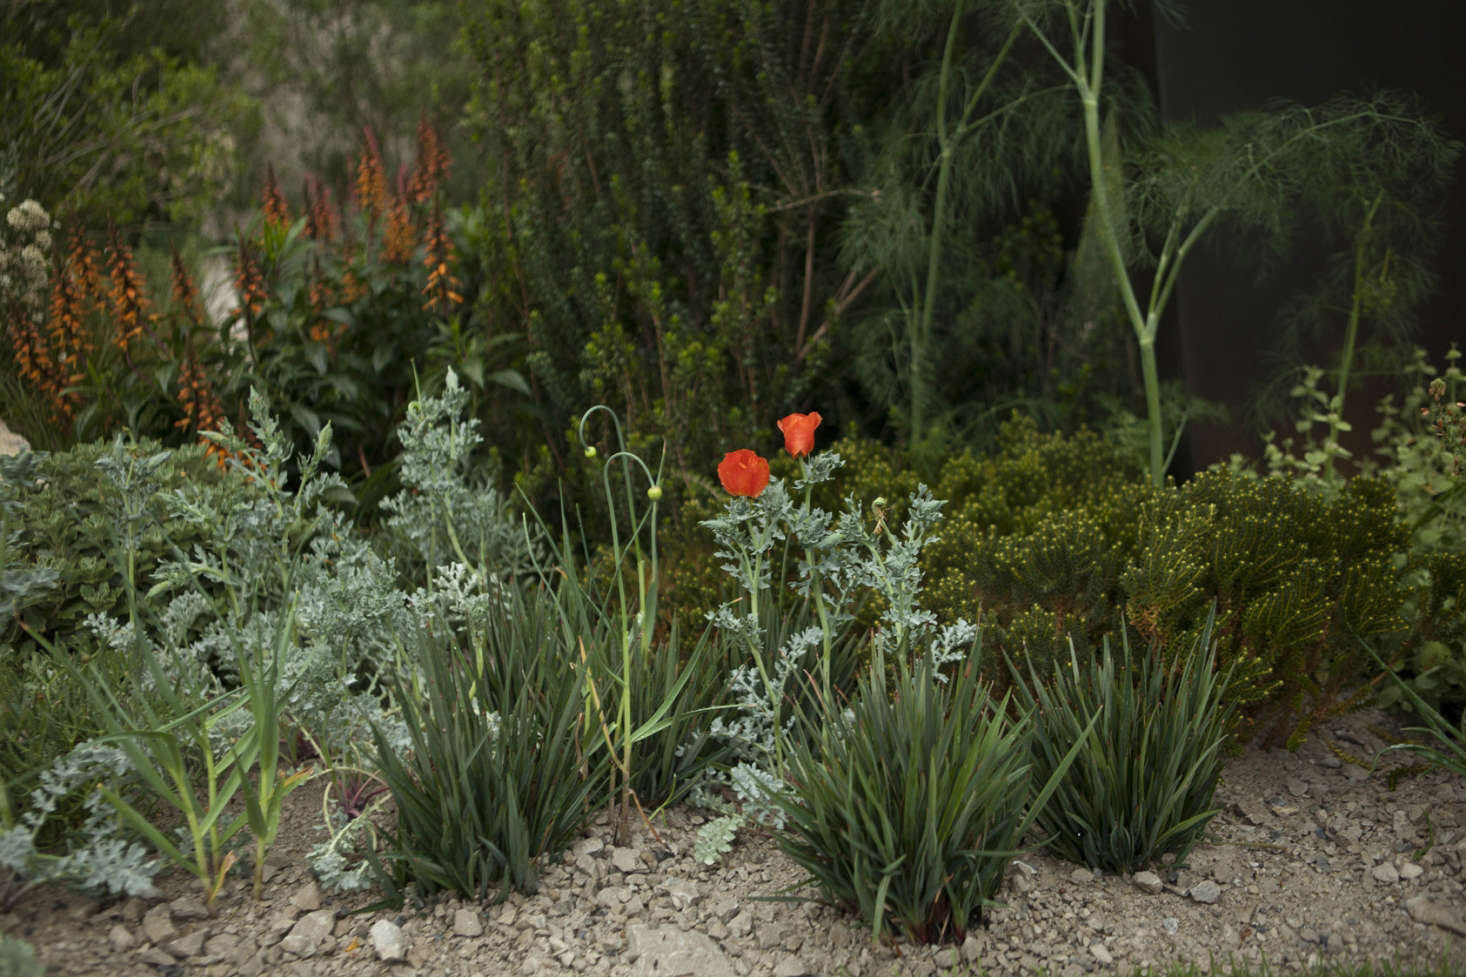 Plants growing in gravel Andy Sturgeon&#8